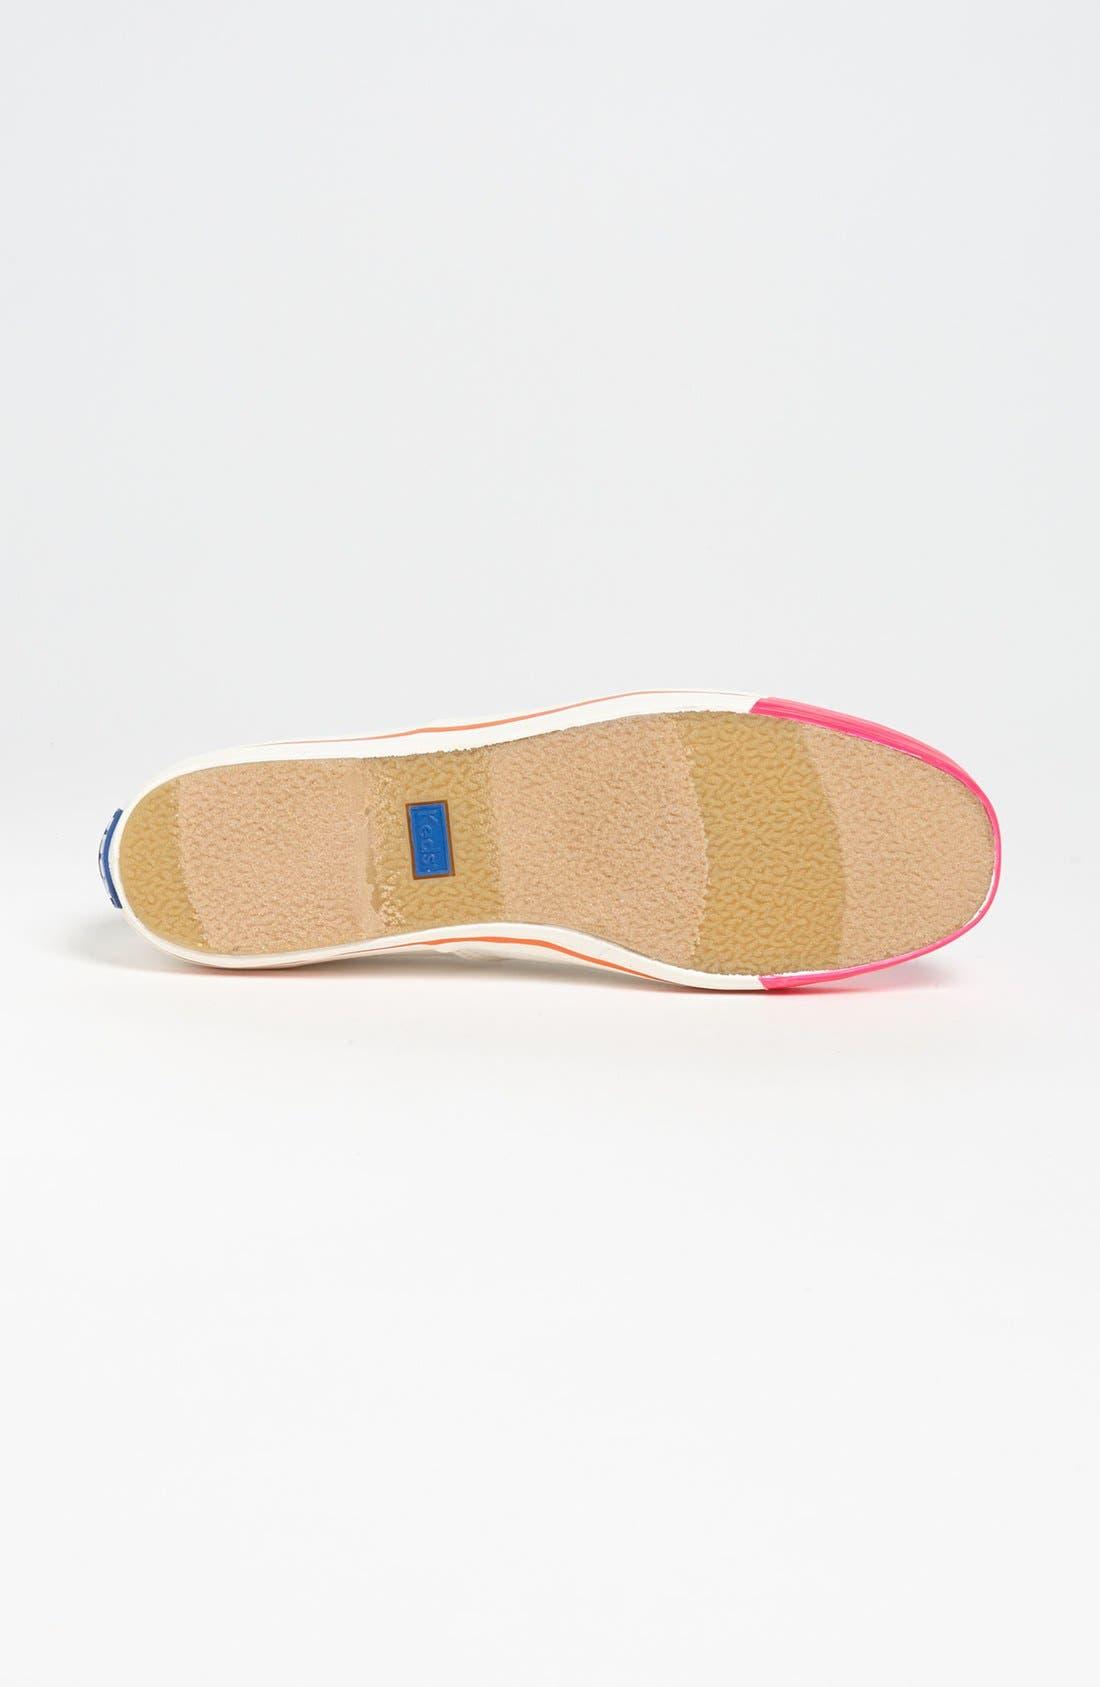 Keds<sup>®</sup> for kate spade new york 'kick' sneaker,                             Alternate thumbnail 15, color,